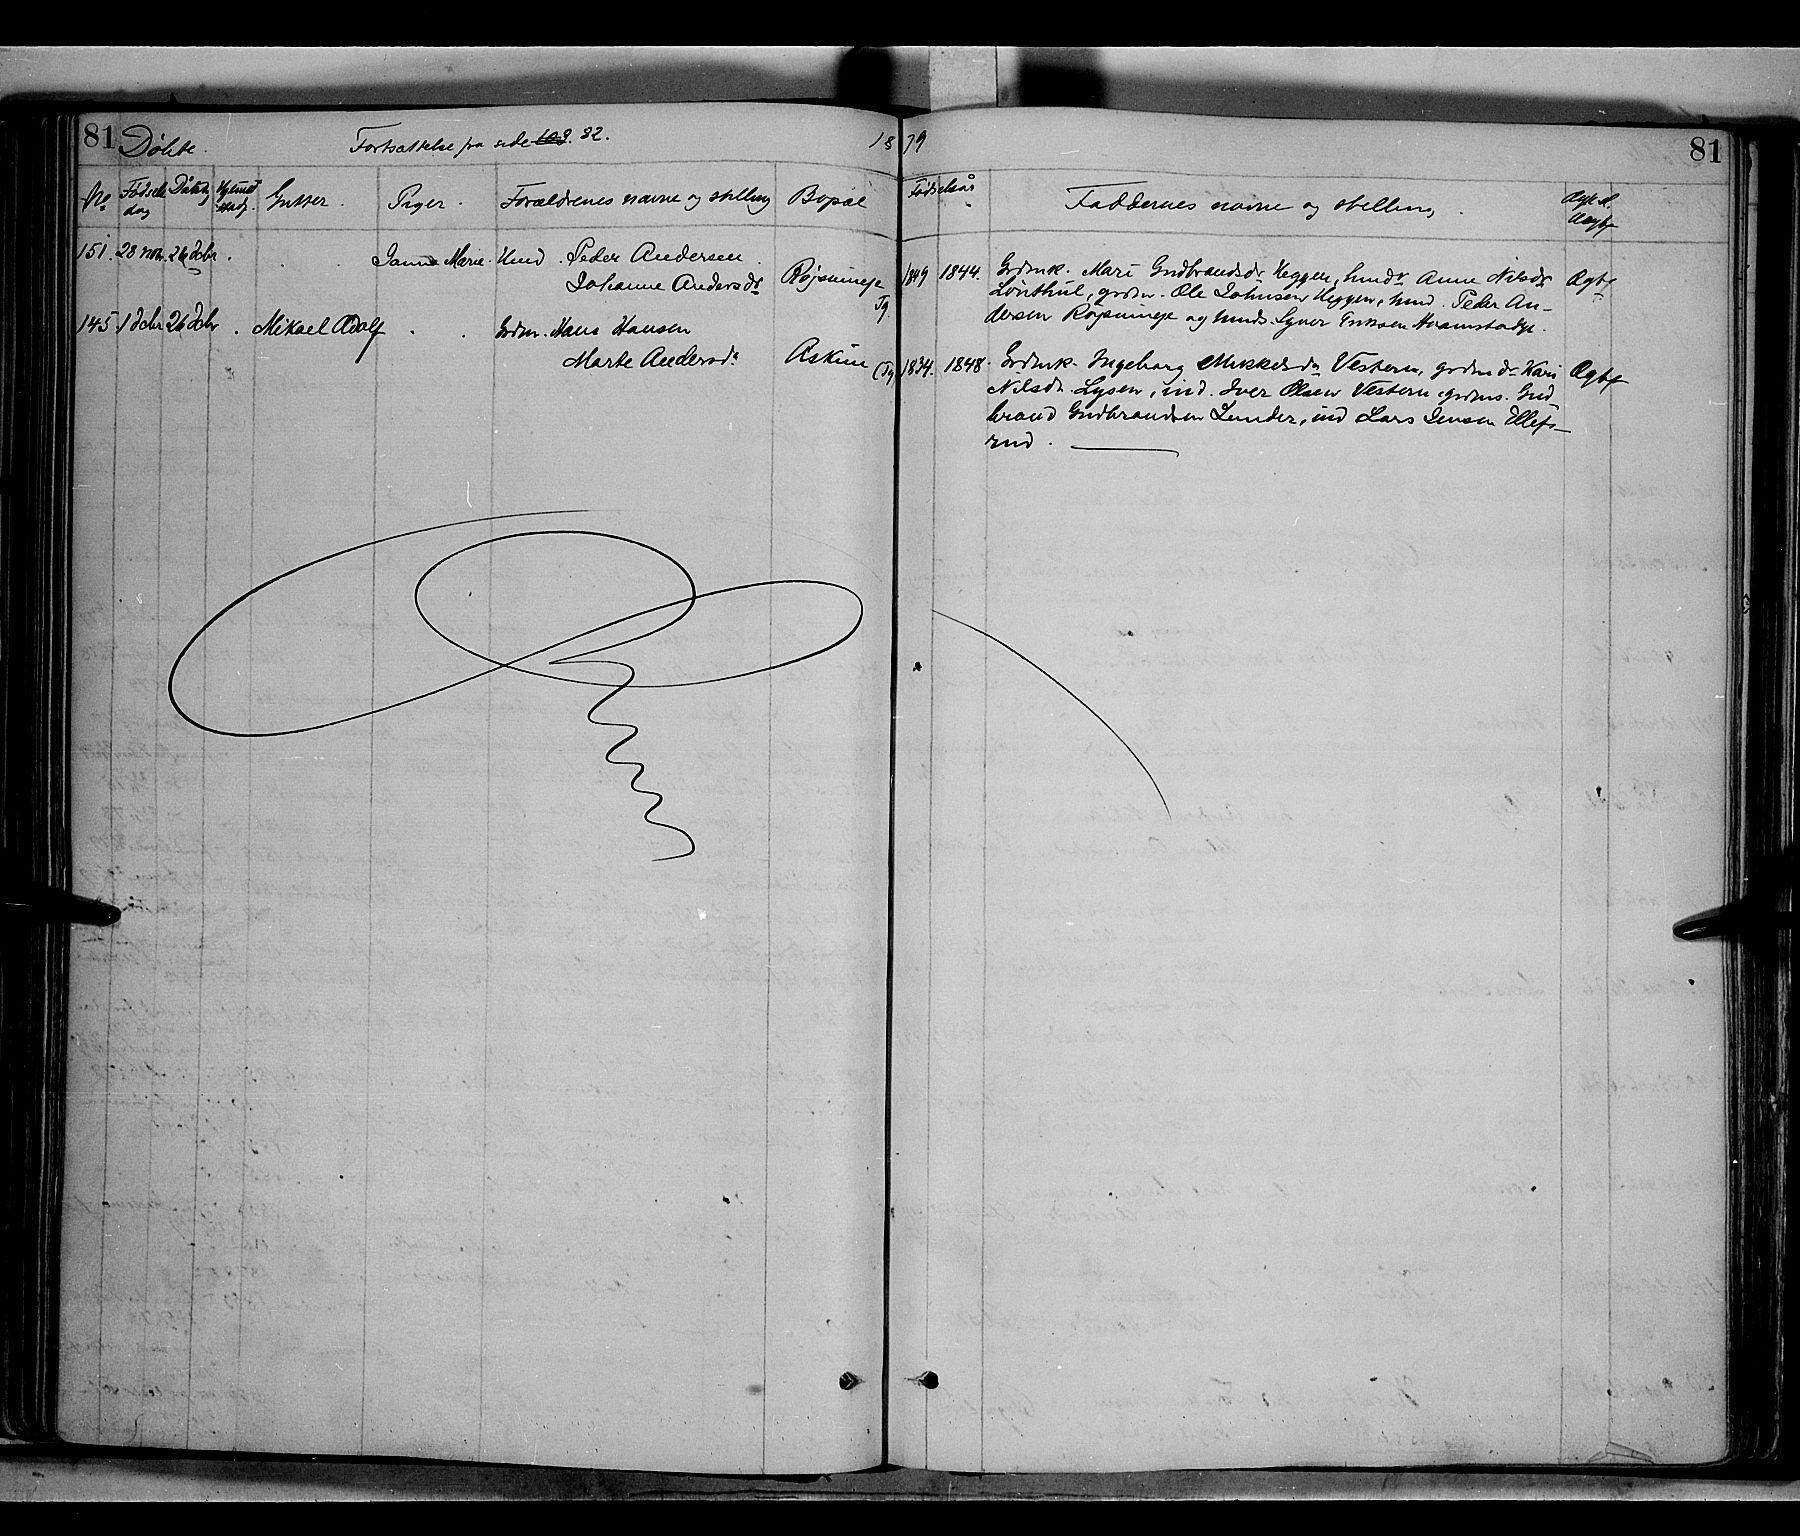 SAH, Gran prestekontor, Ministerialbok nr. 13, 1875-1879, s. 81